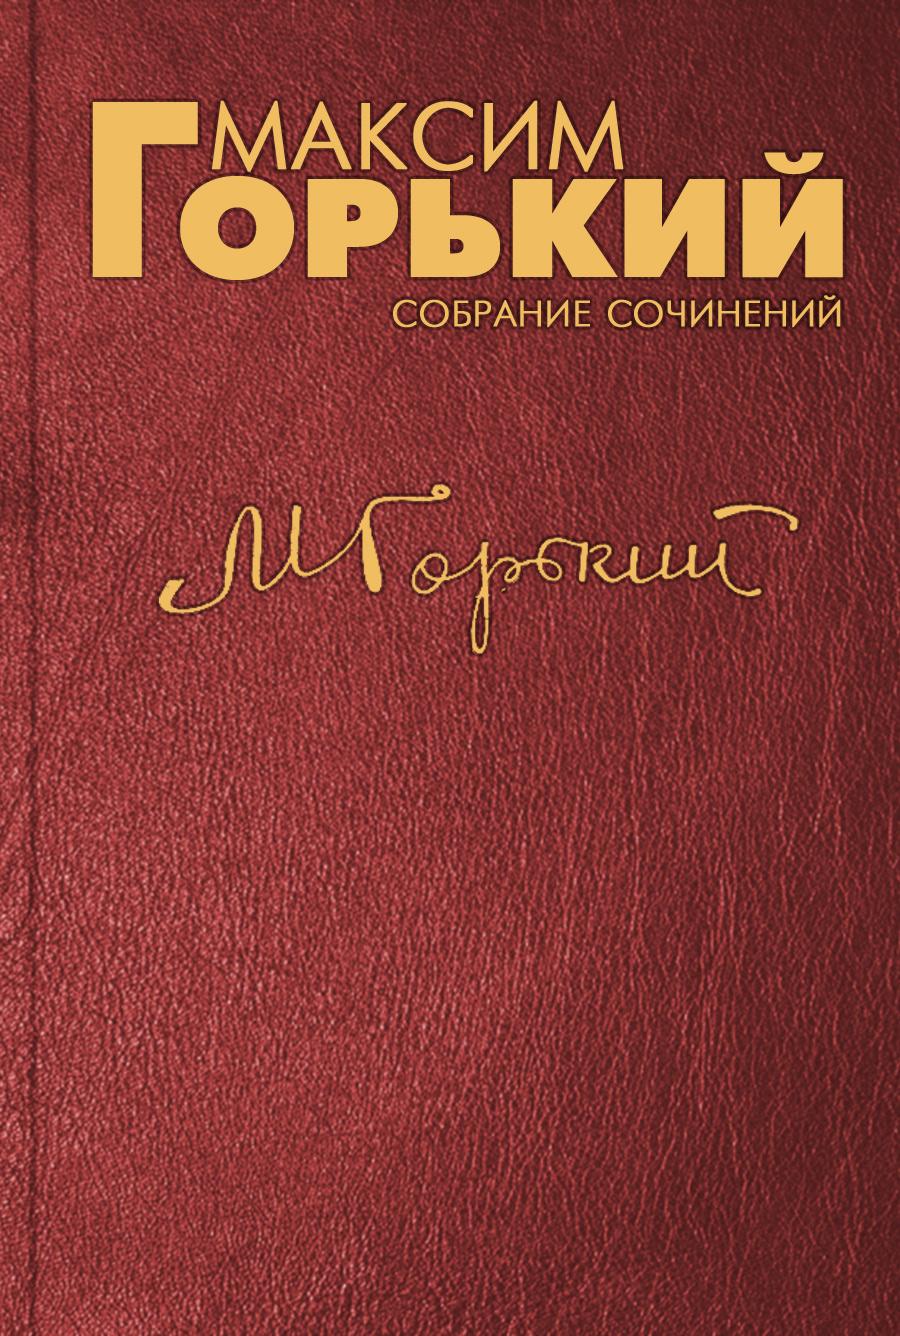 Максим Горький Письмо курским красноармейцам максим горький на дне